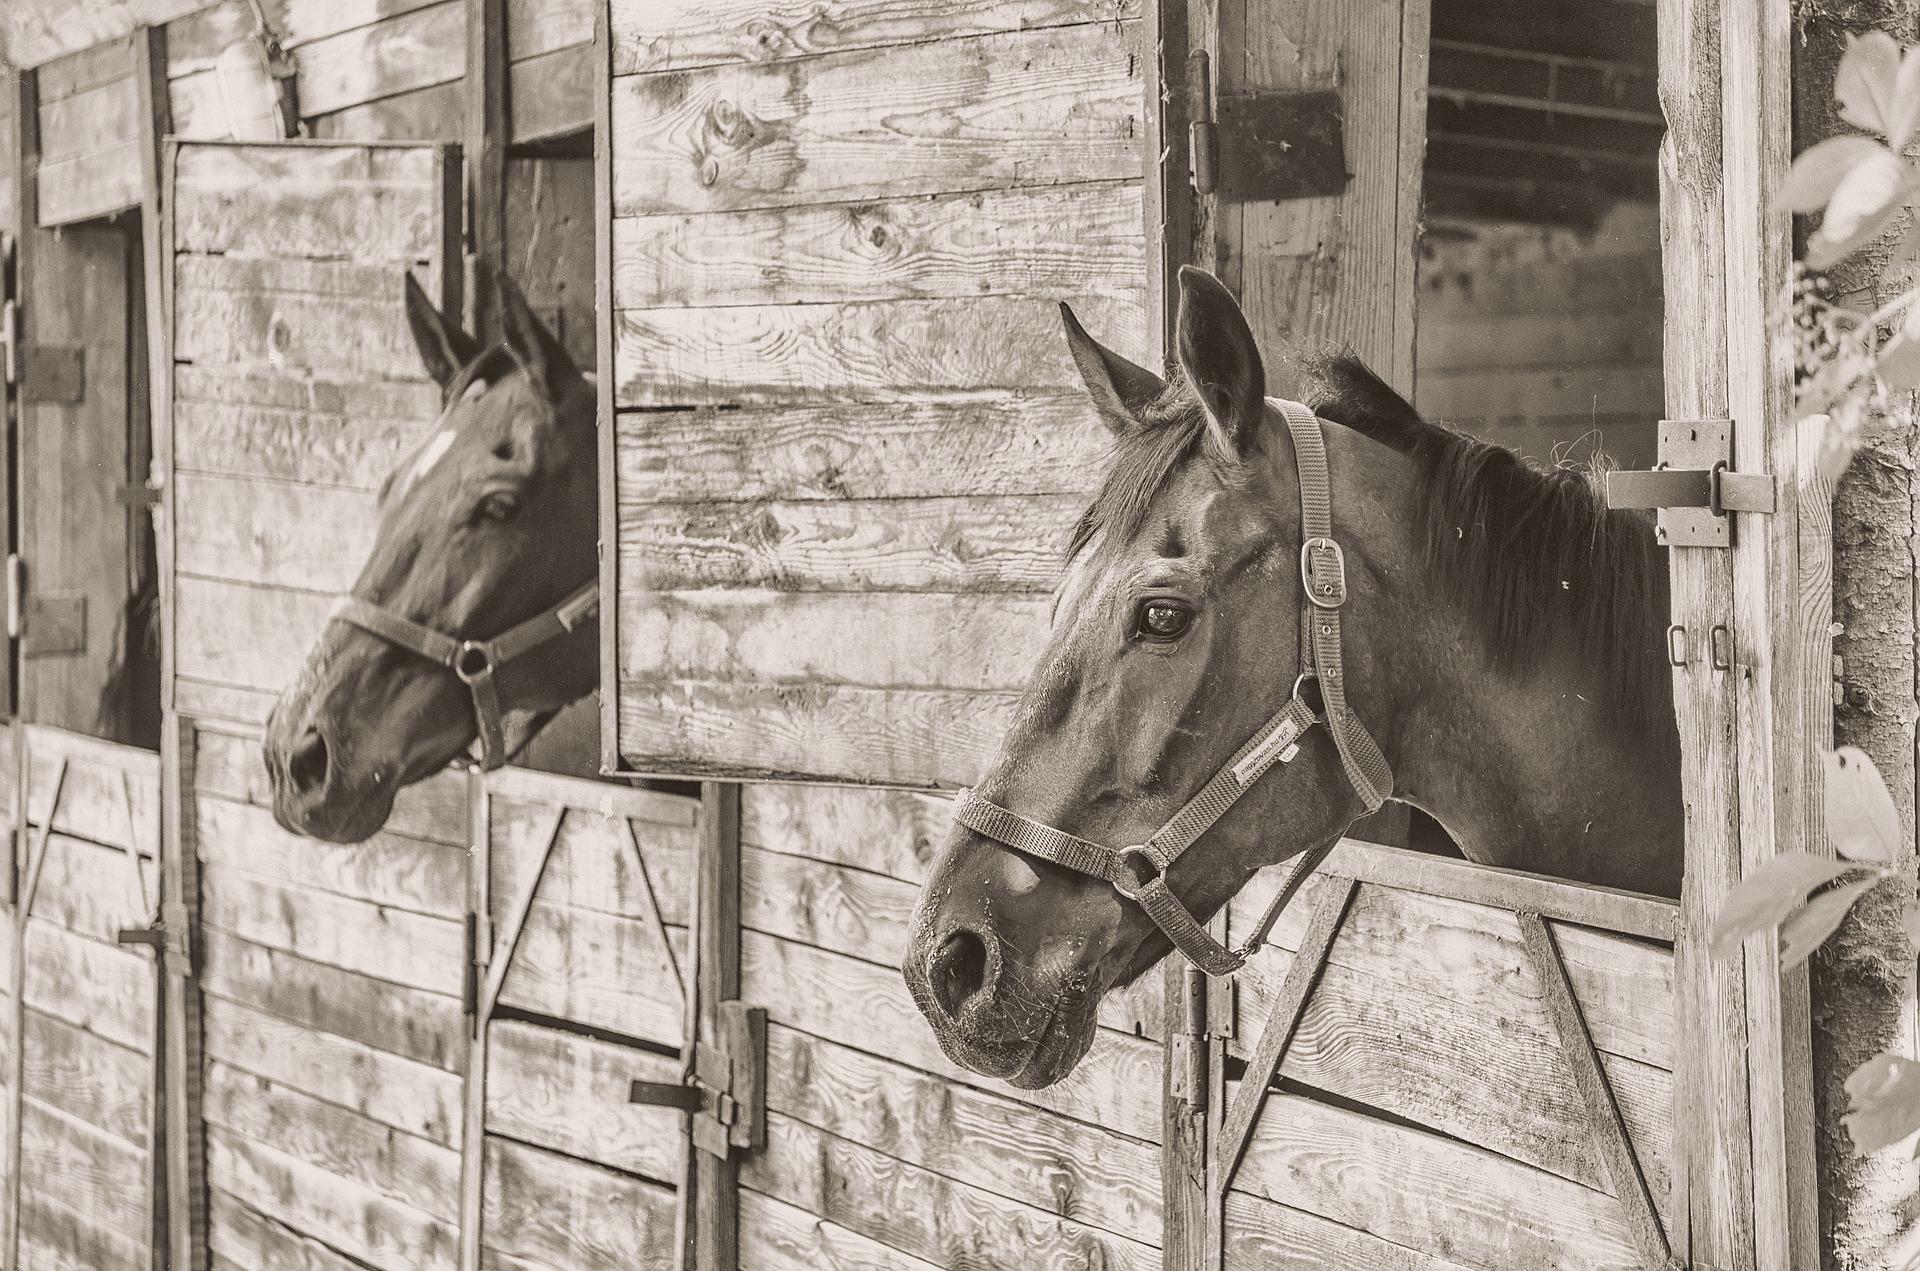 horses, horse manure crisis, photography, animal photography, great horse manure crisis of 1894